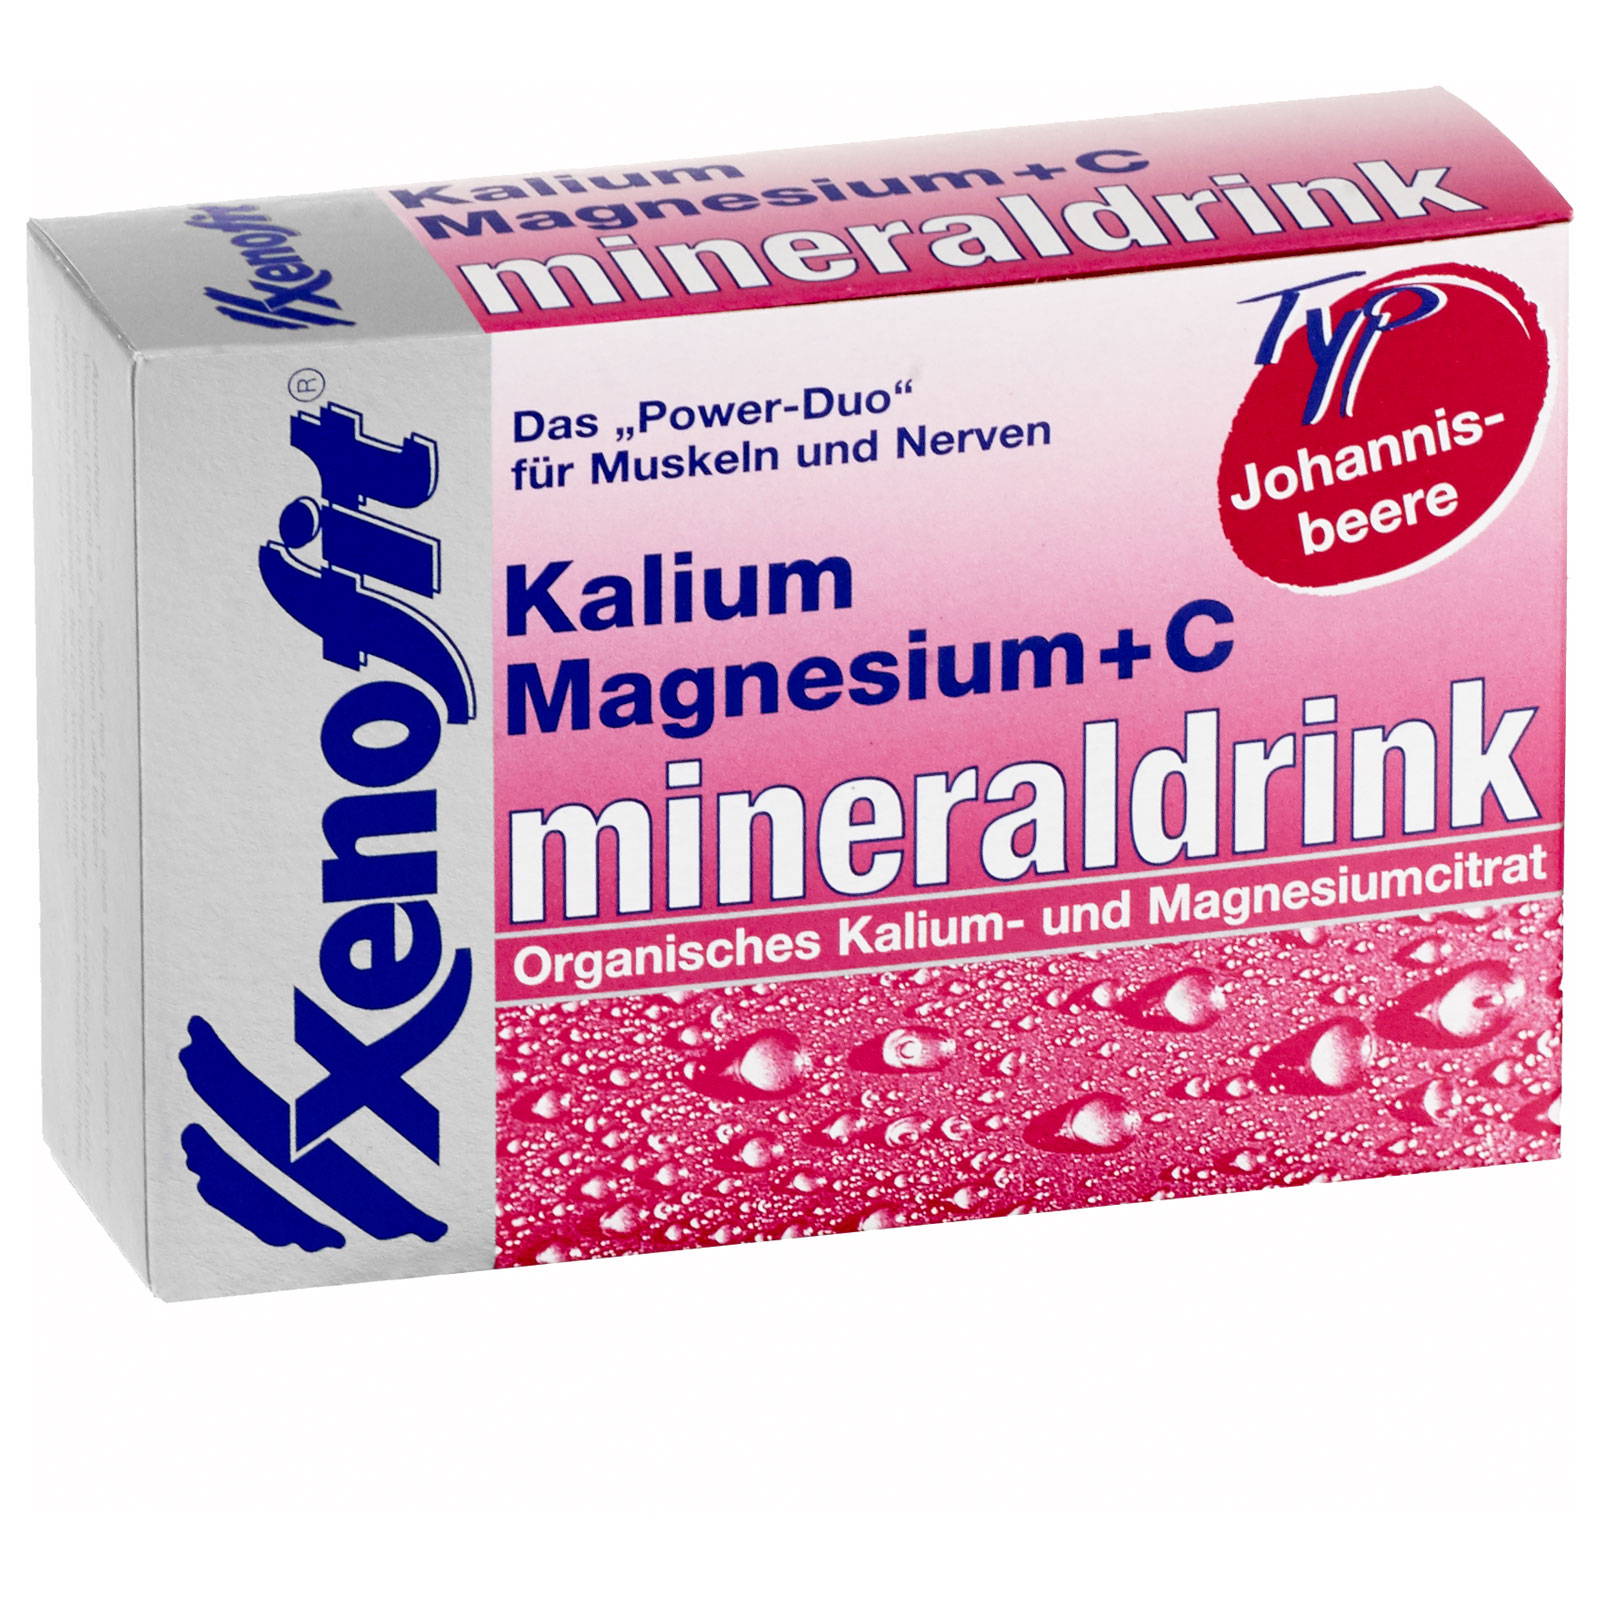 Bild von Xenofit Kalium + Magnesium + Vitamin C Mineraldrink Granulat - 20x5,7g